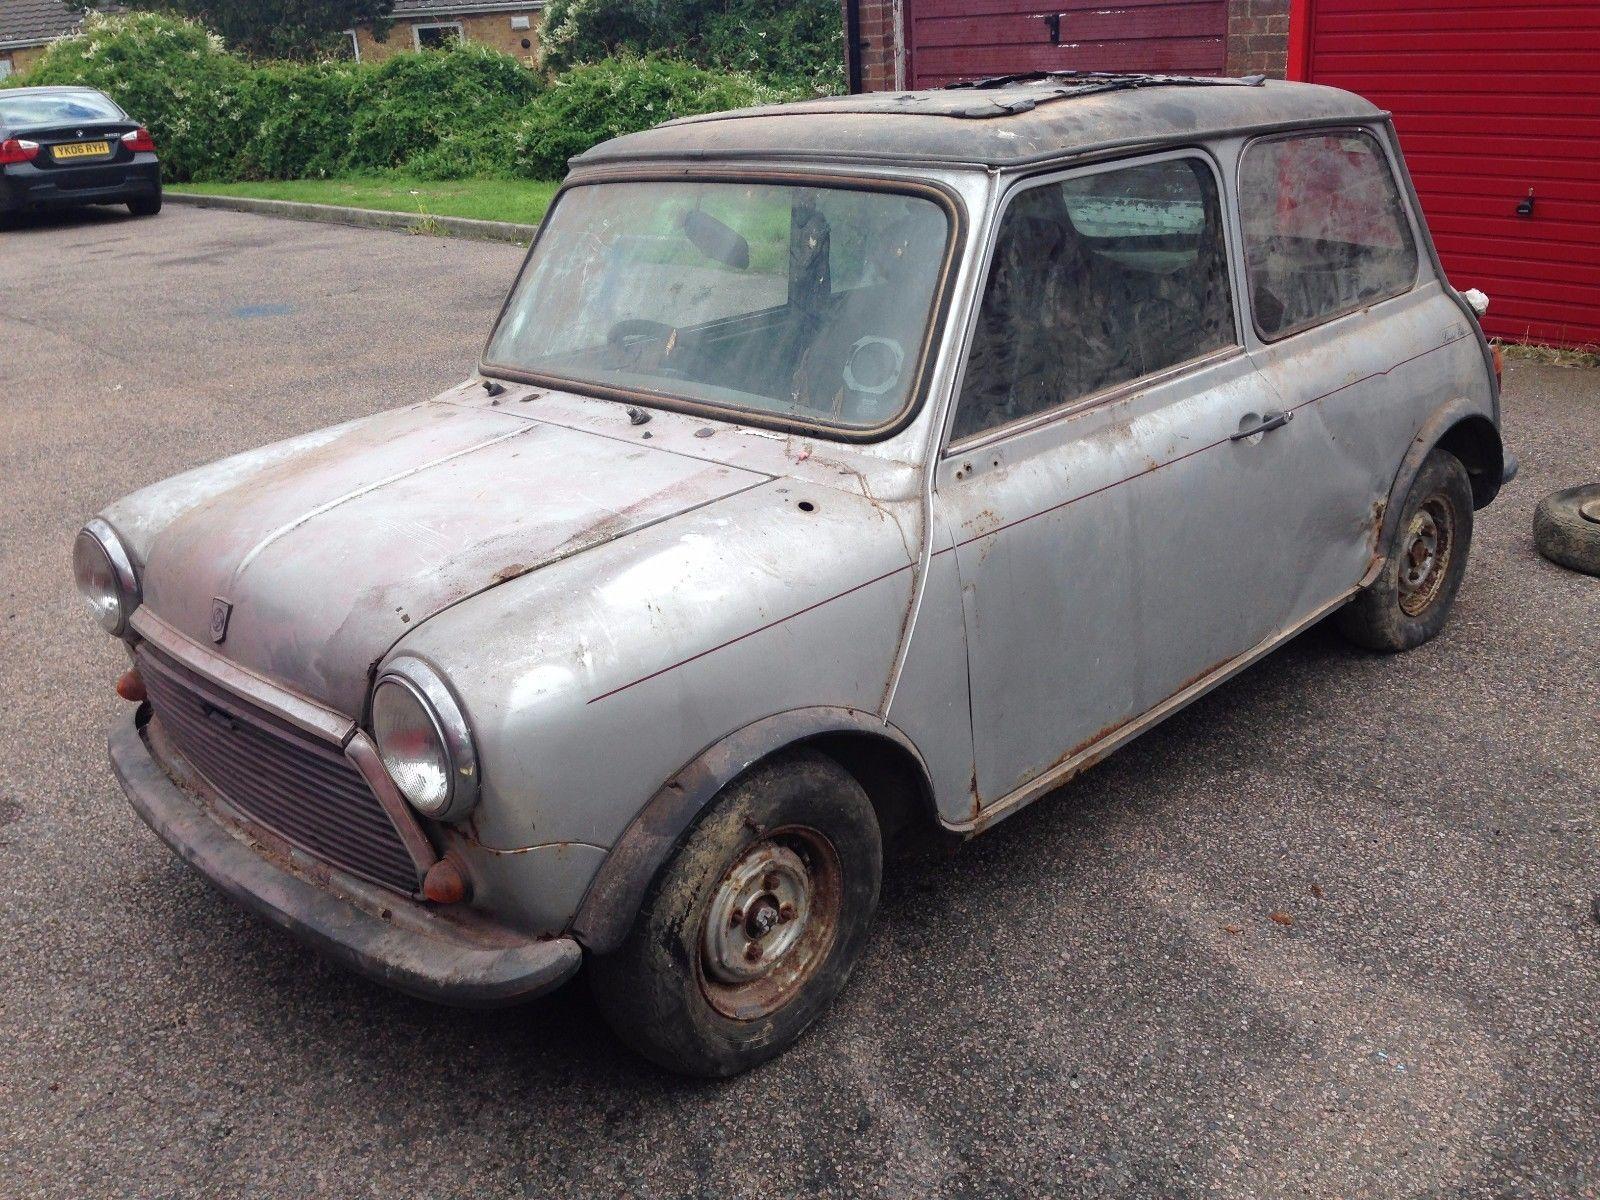 eBay: CLASSIC AUSTIN MINI 25 LE 998cc RESTORATION PROJECT OR FOR ...